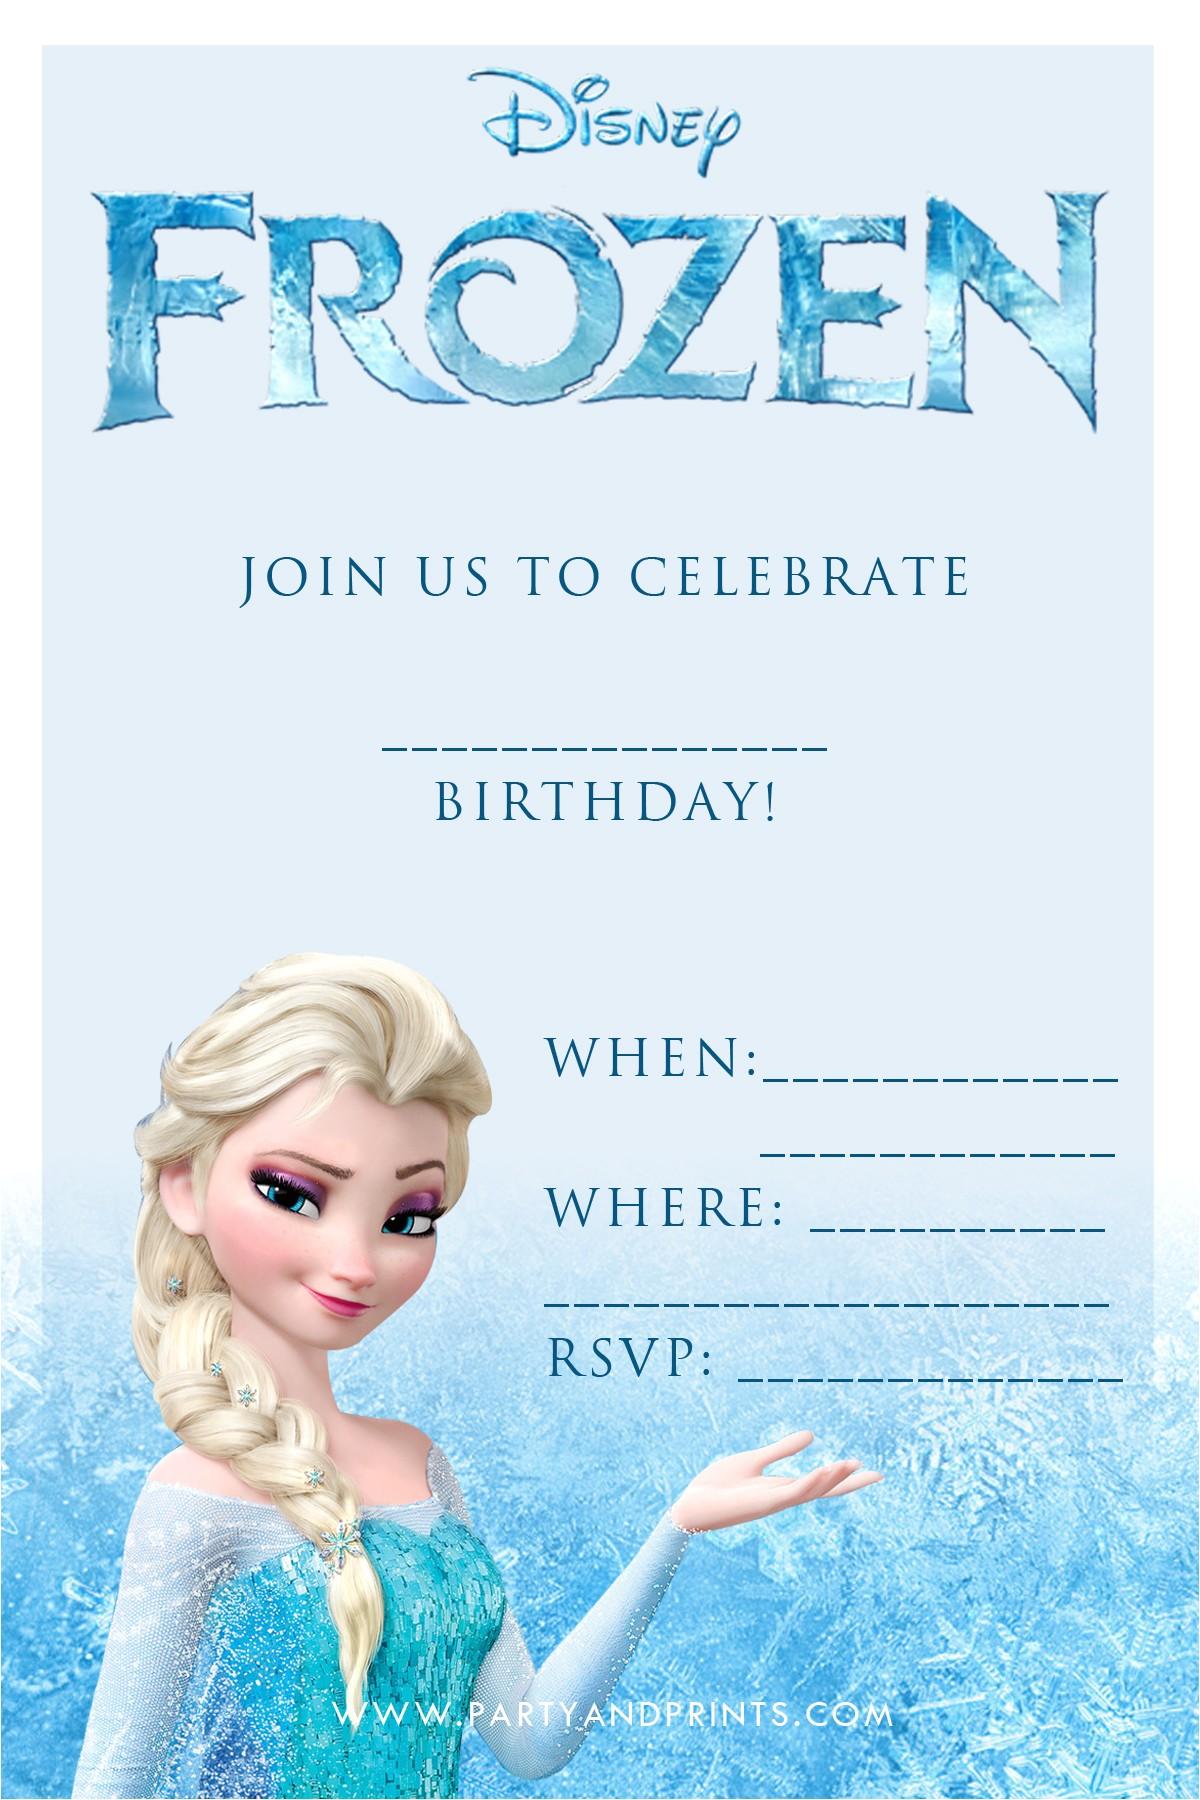 Frozen Birthday Invitations Printable 20 Frozen Birthday Party Ideas